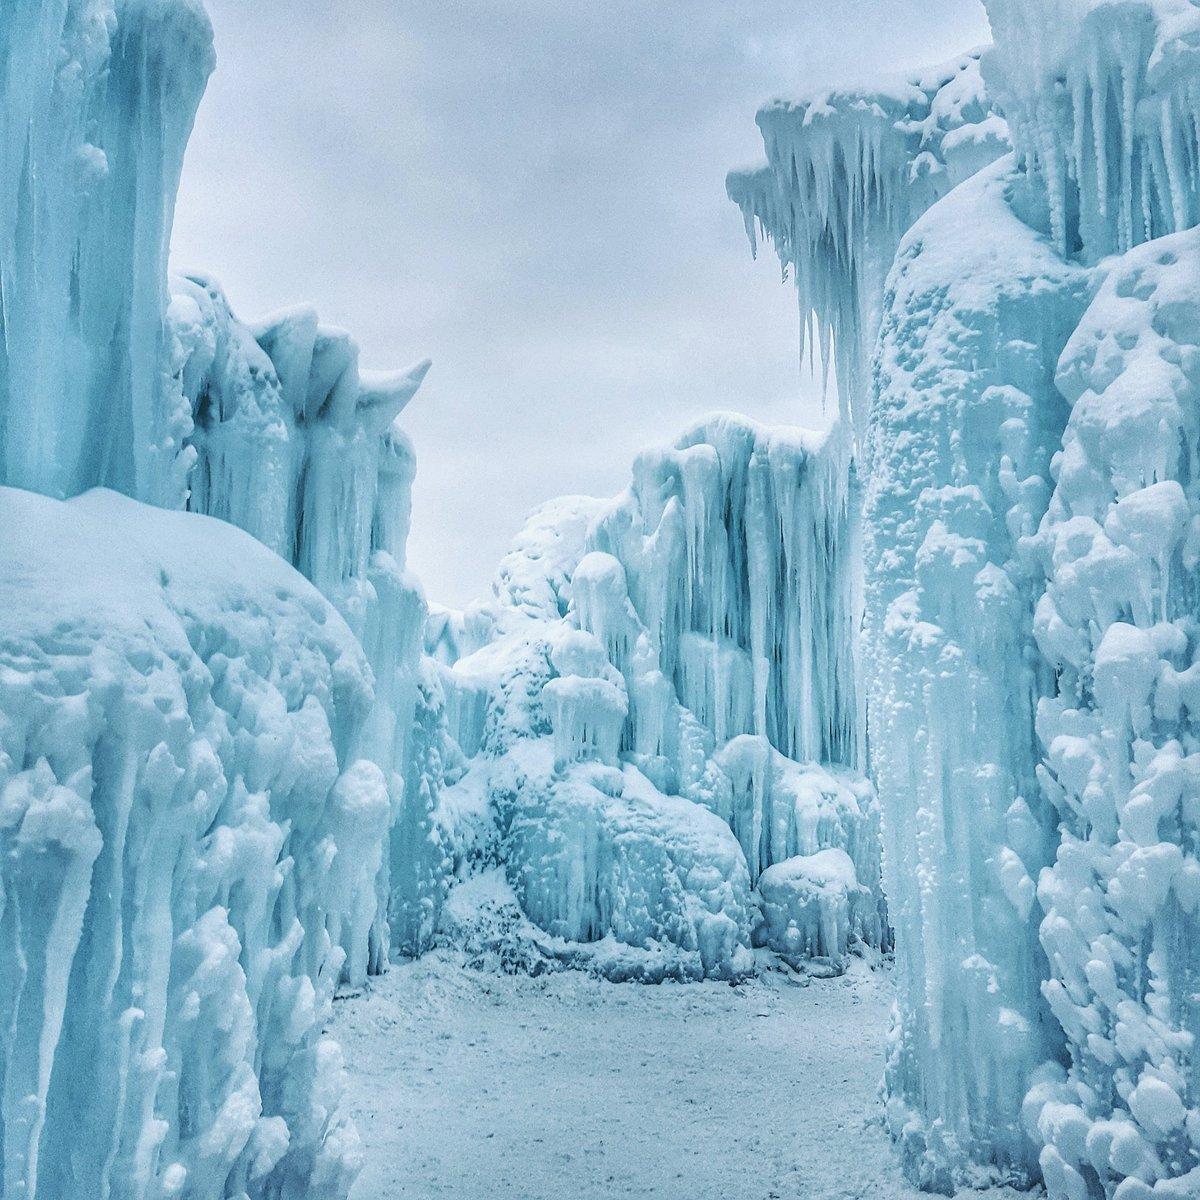 ice castle by kimesama - photo #10